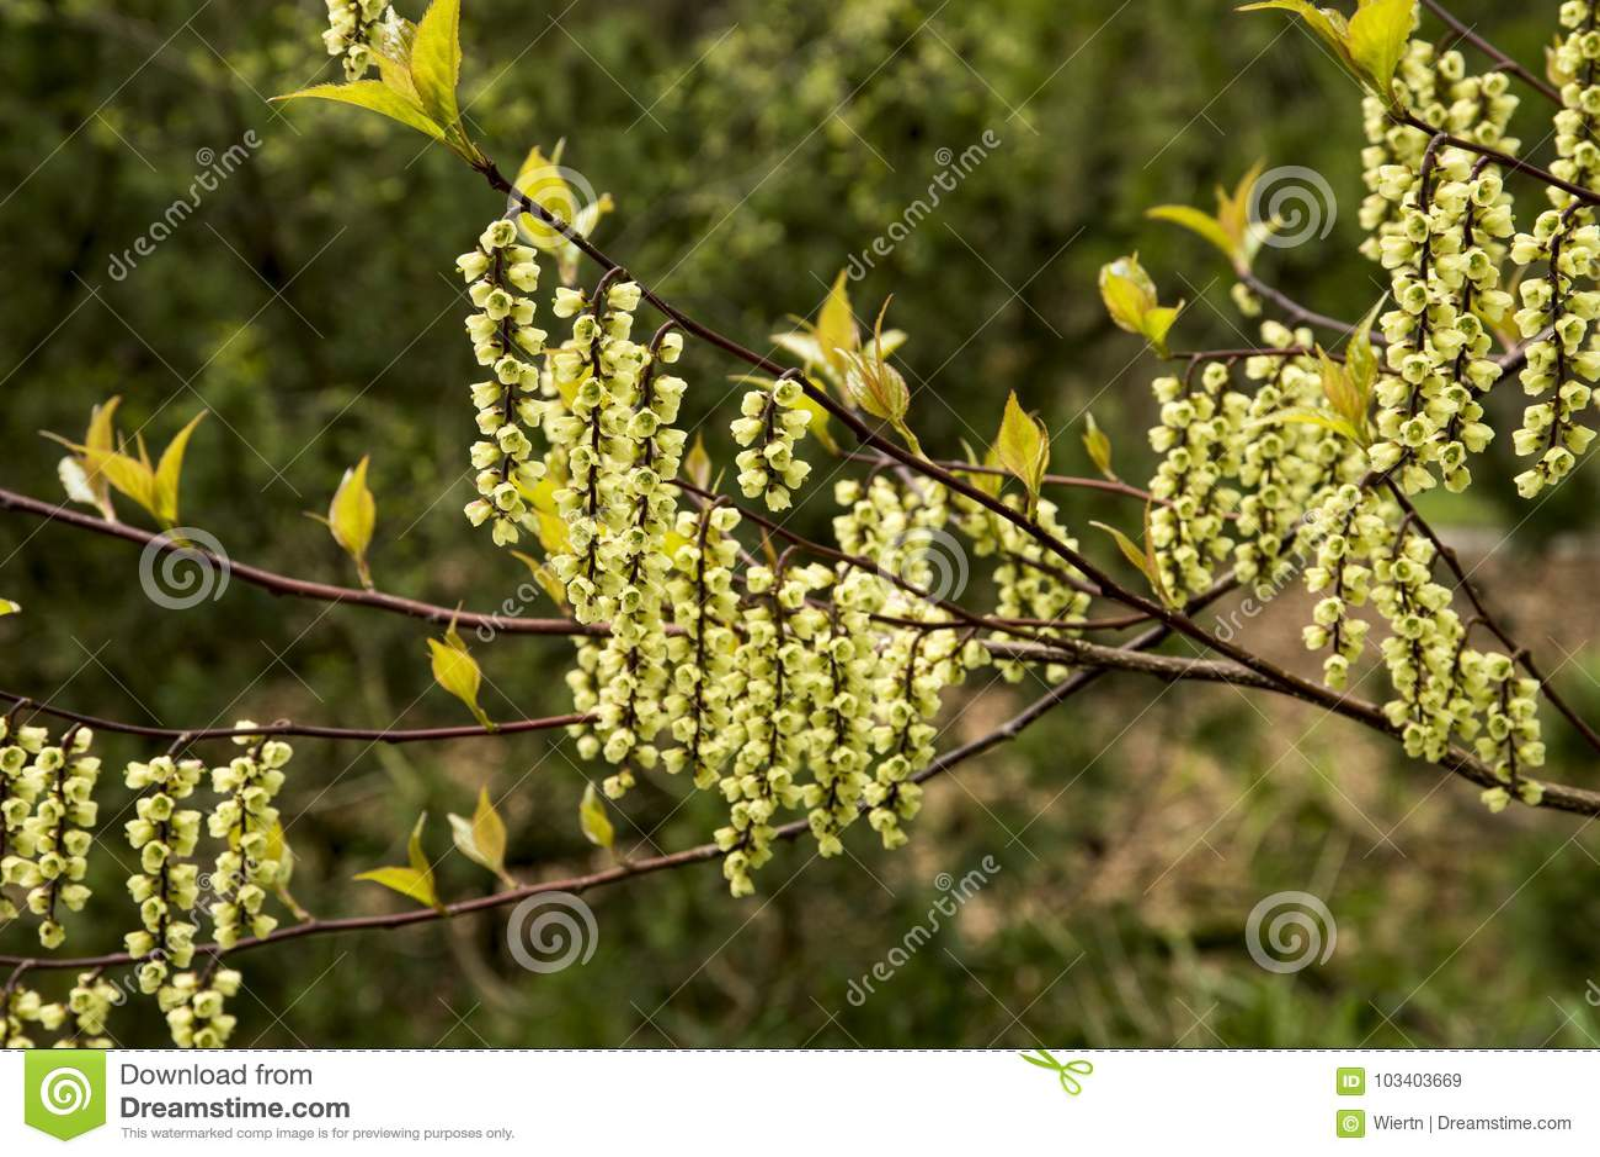 Stachyurus Chinensis Stock Image Image Of Flowers Hanging 103403669